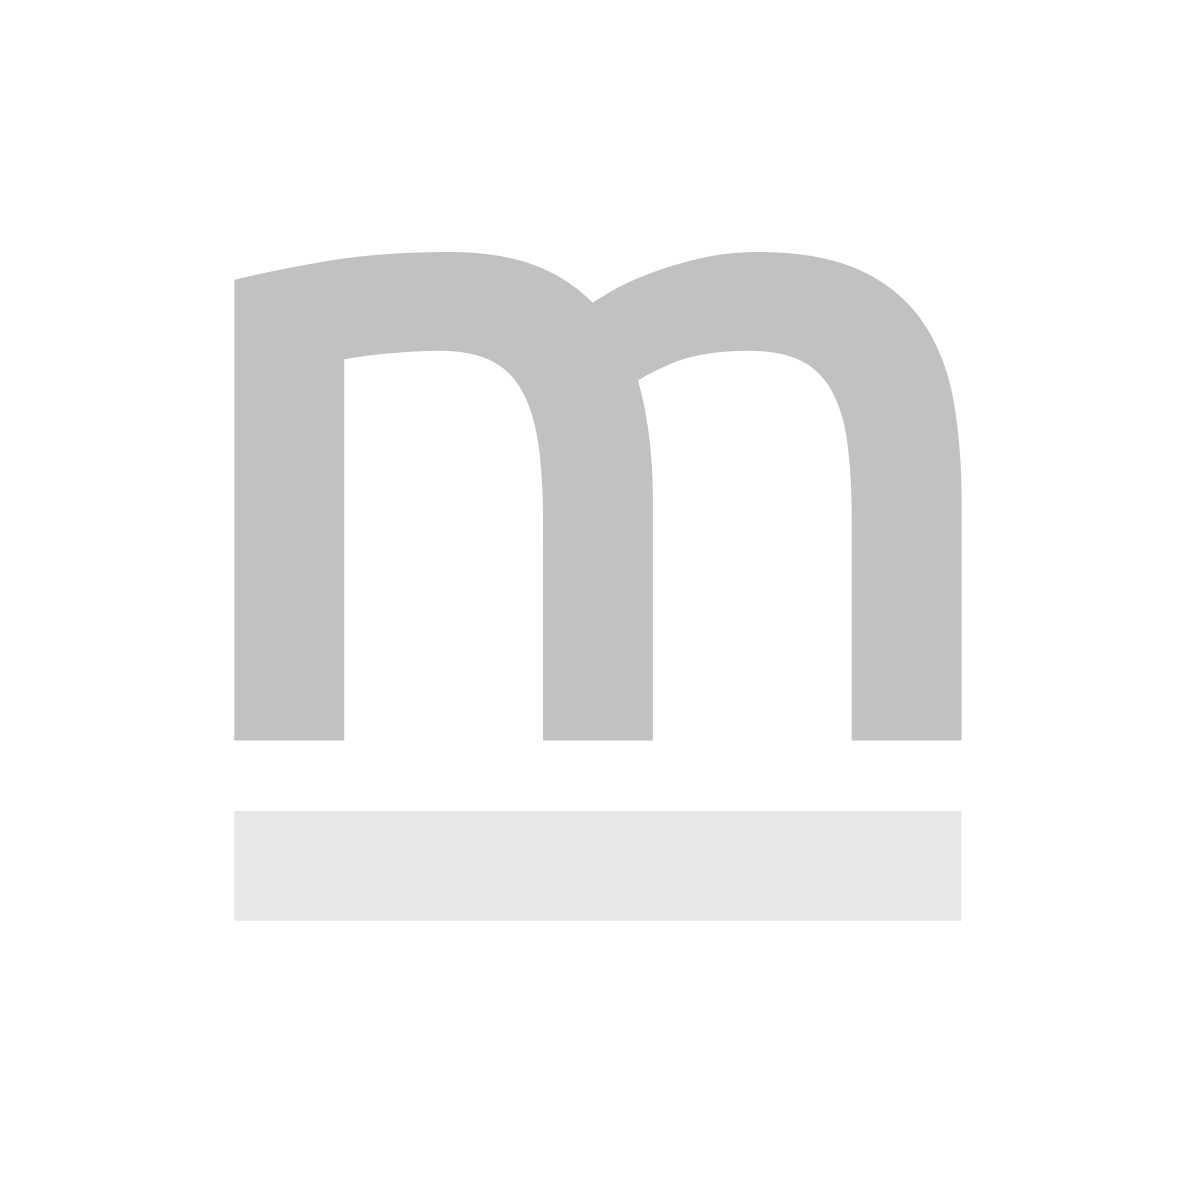 Stół DABLIN 180x90 dąb lite drewno